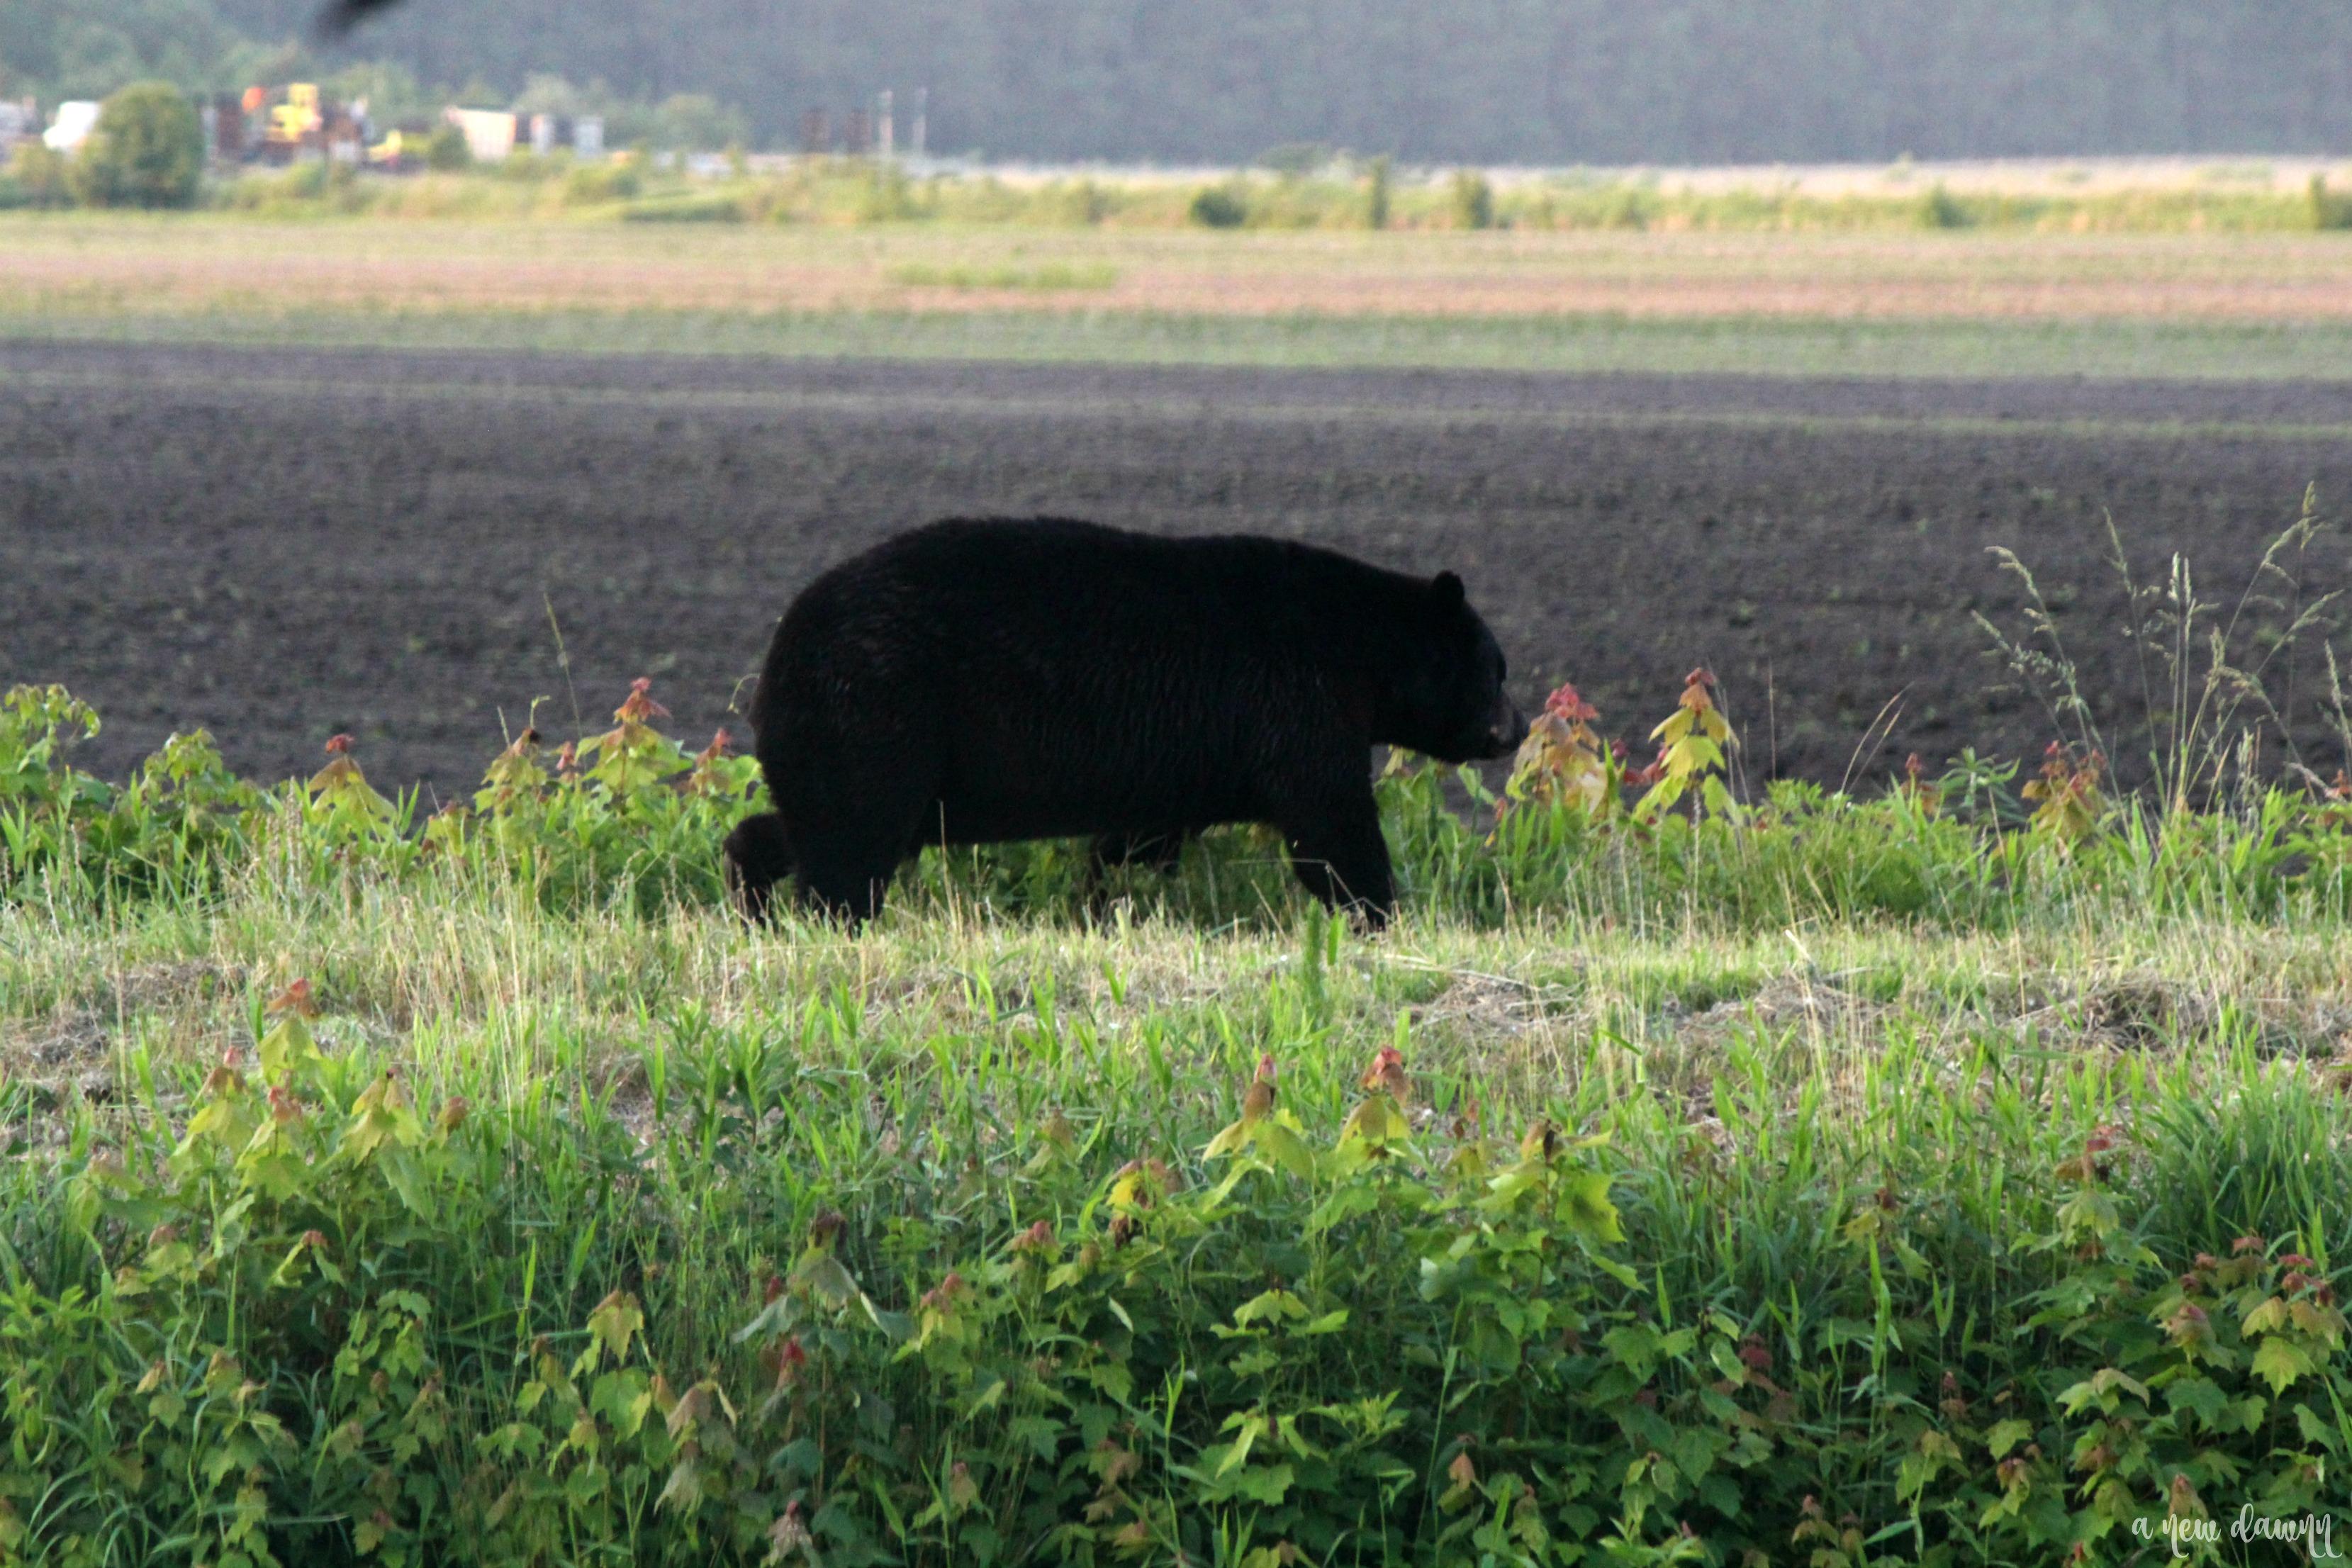 Bear walking by in Alligator River Wildlife Refuge